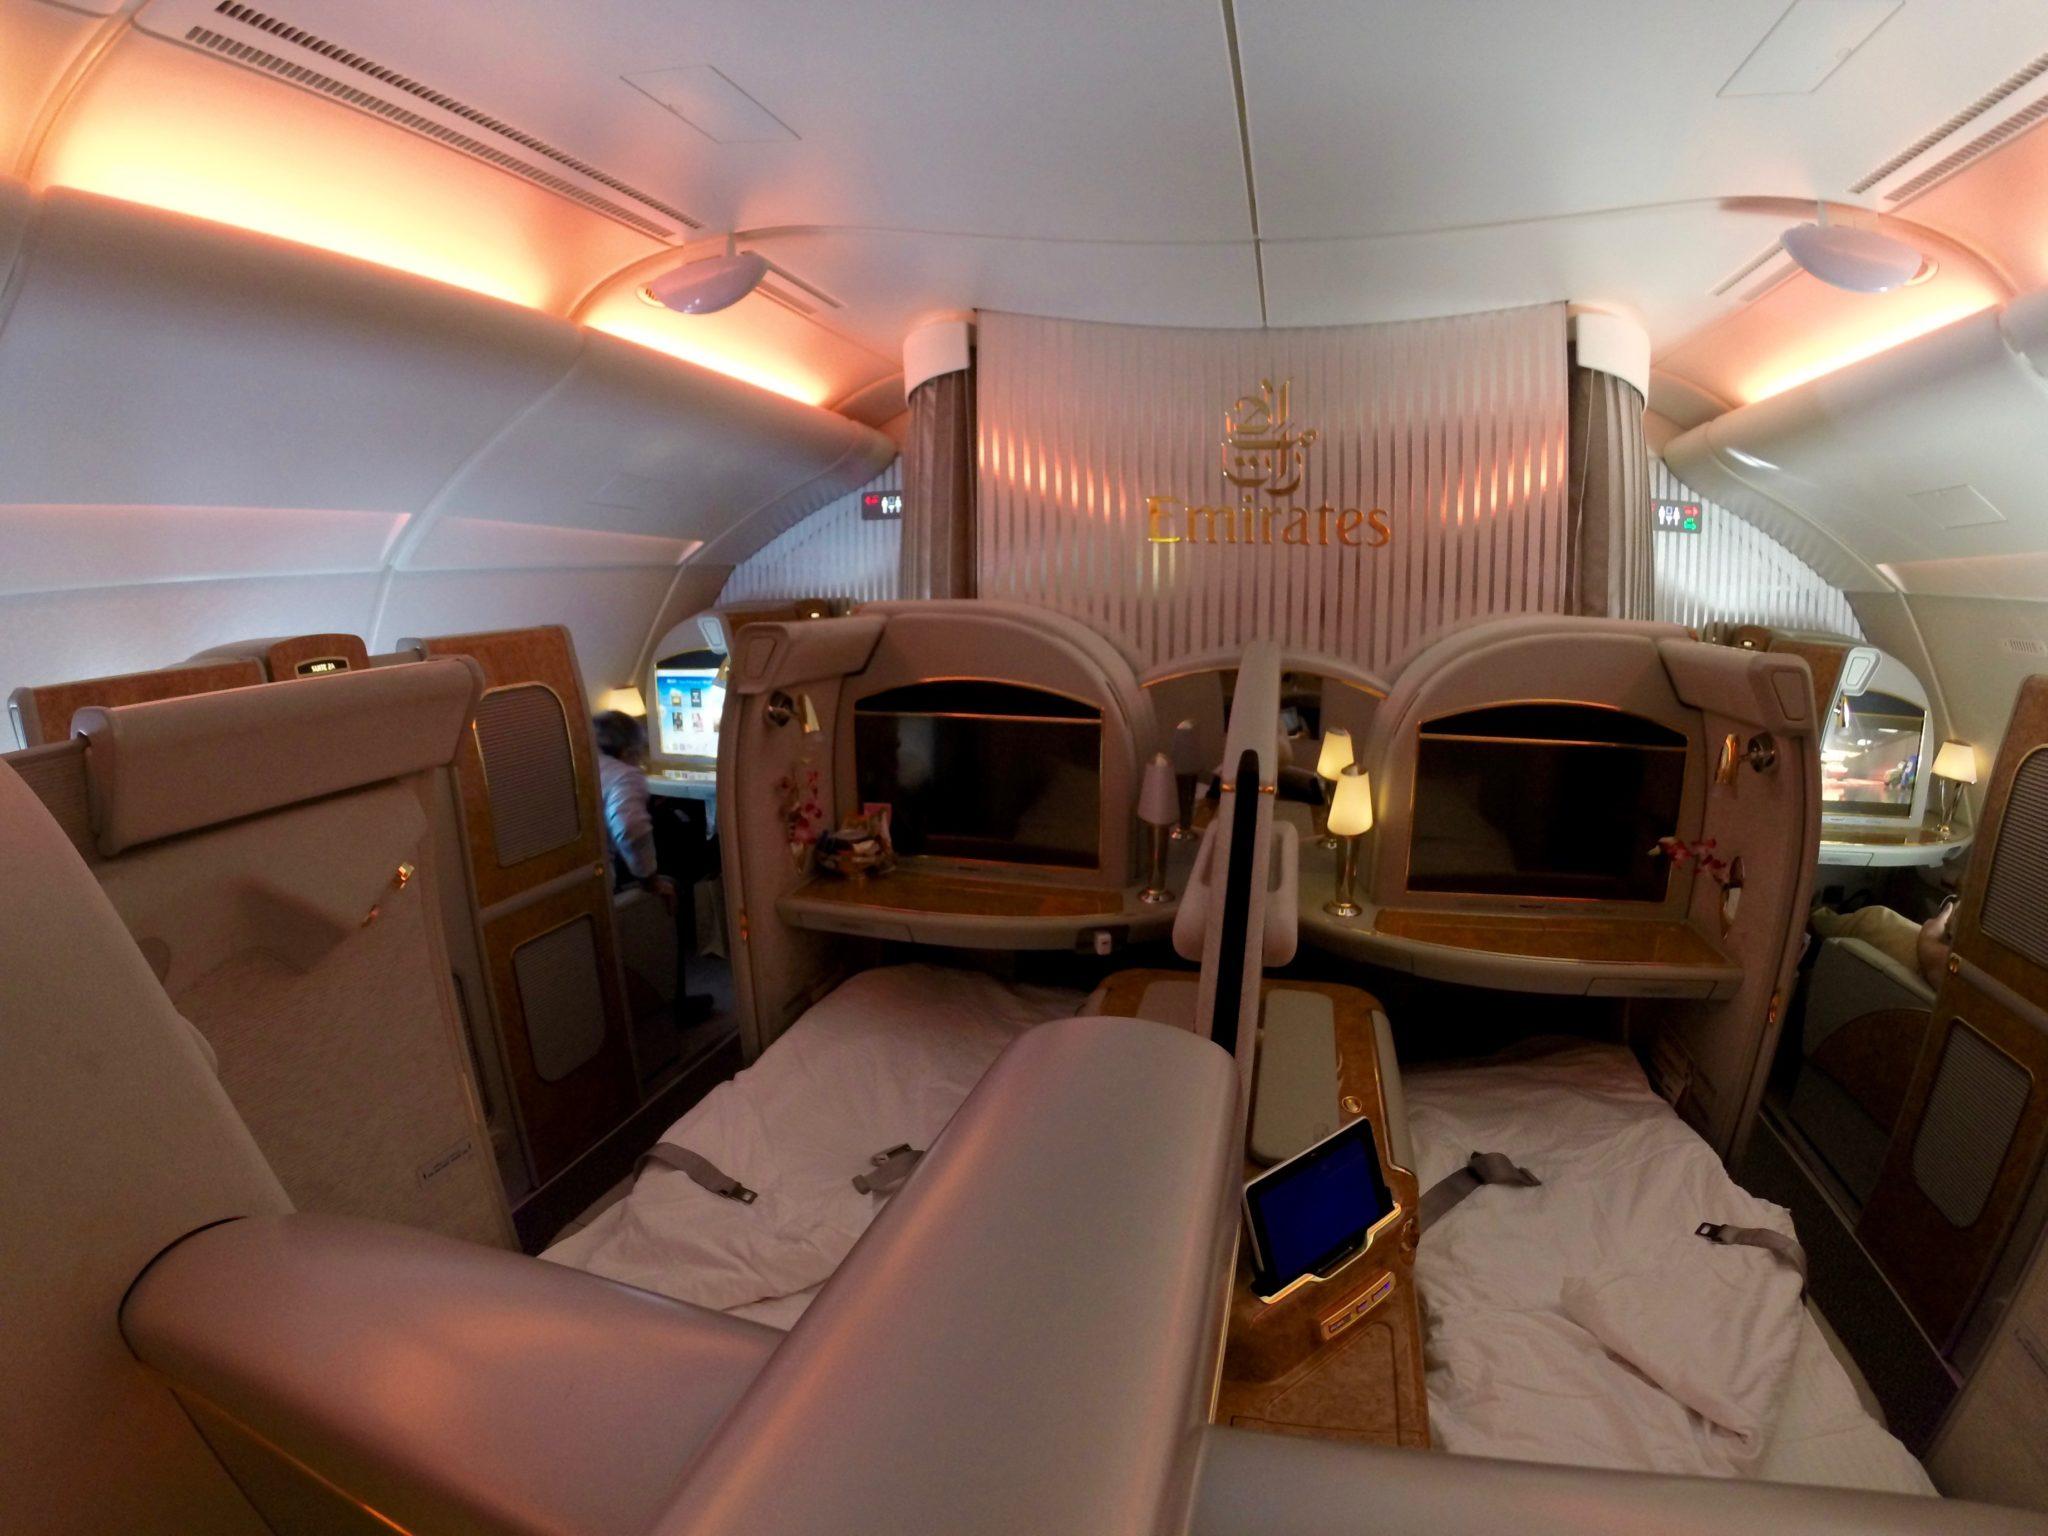 Emirates First Class A380 - Turndown Service